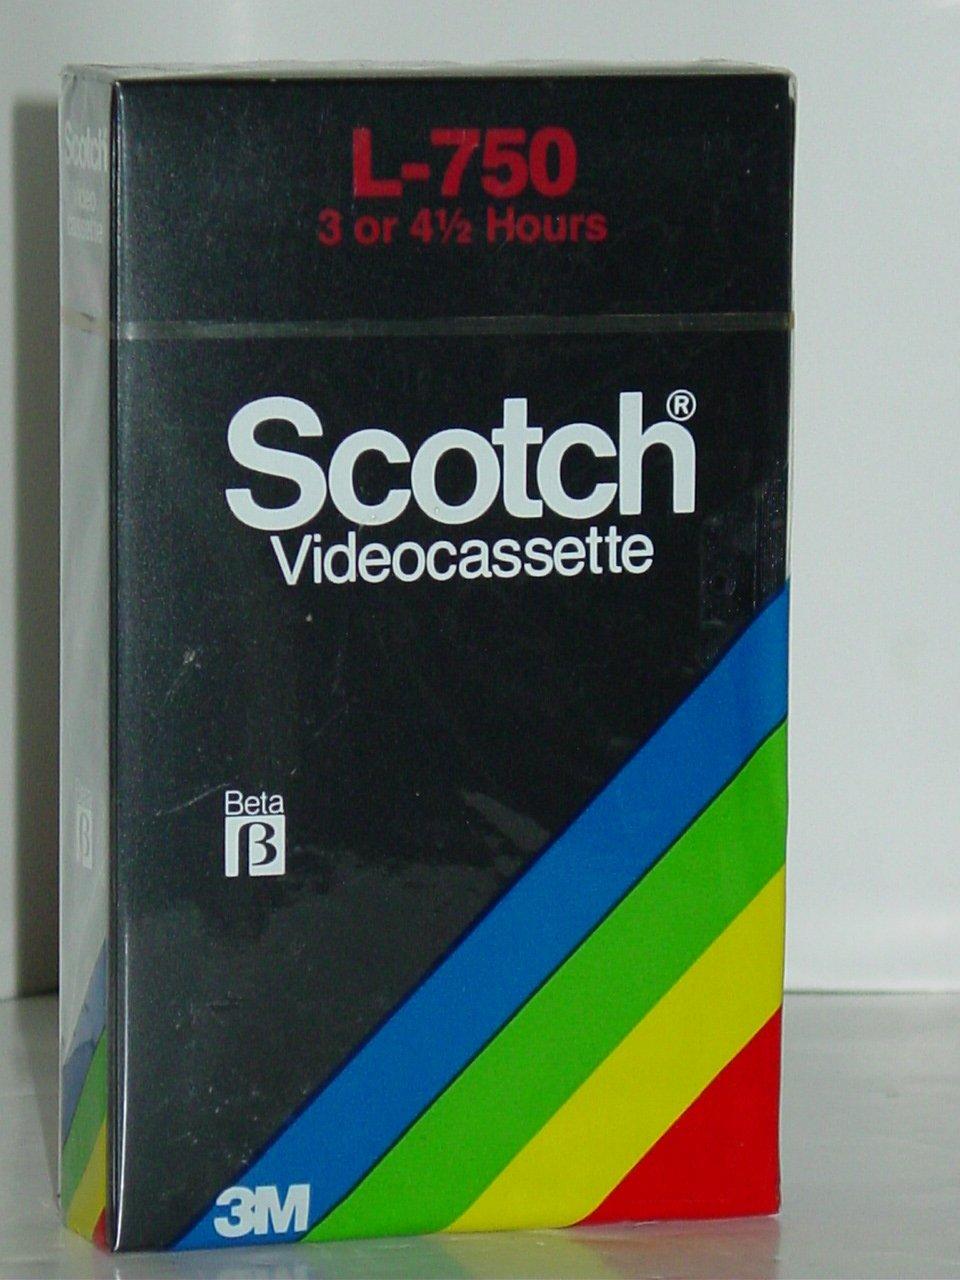 3M Scotch L-750 Blank Beta Video Cassette Tape 3 or 4 ½ Hours L75